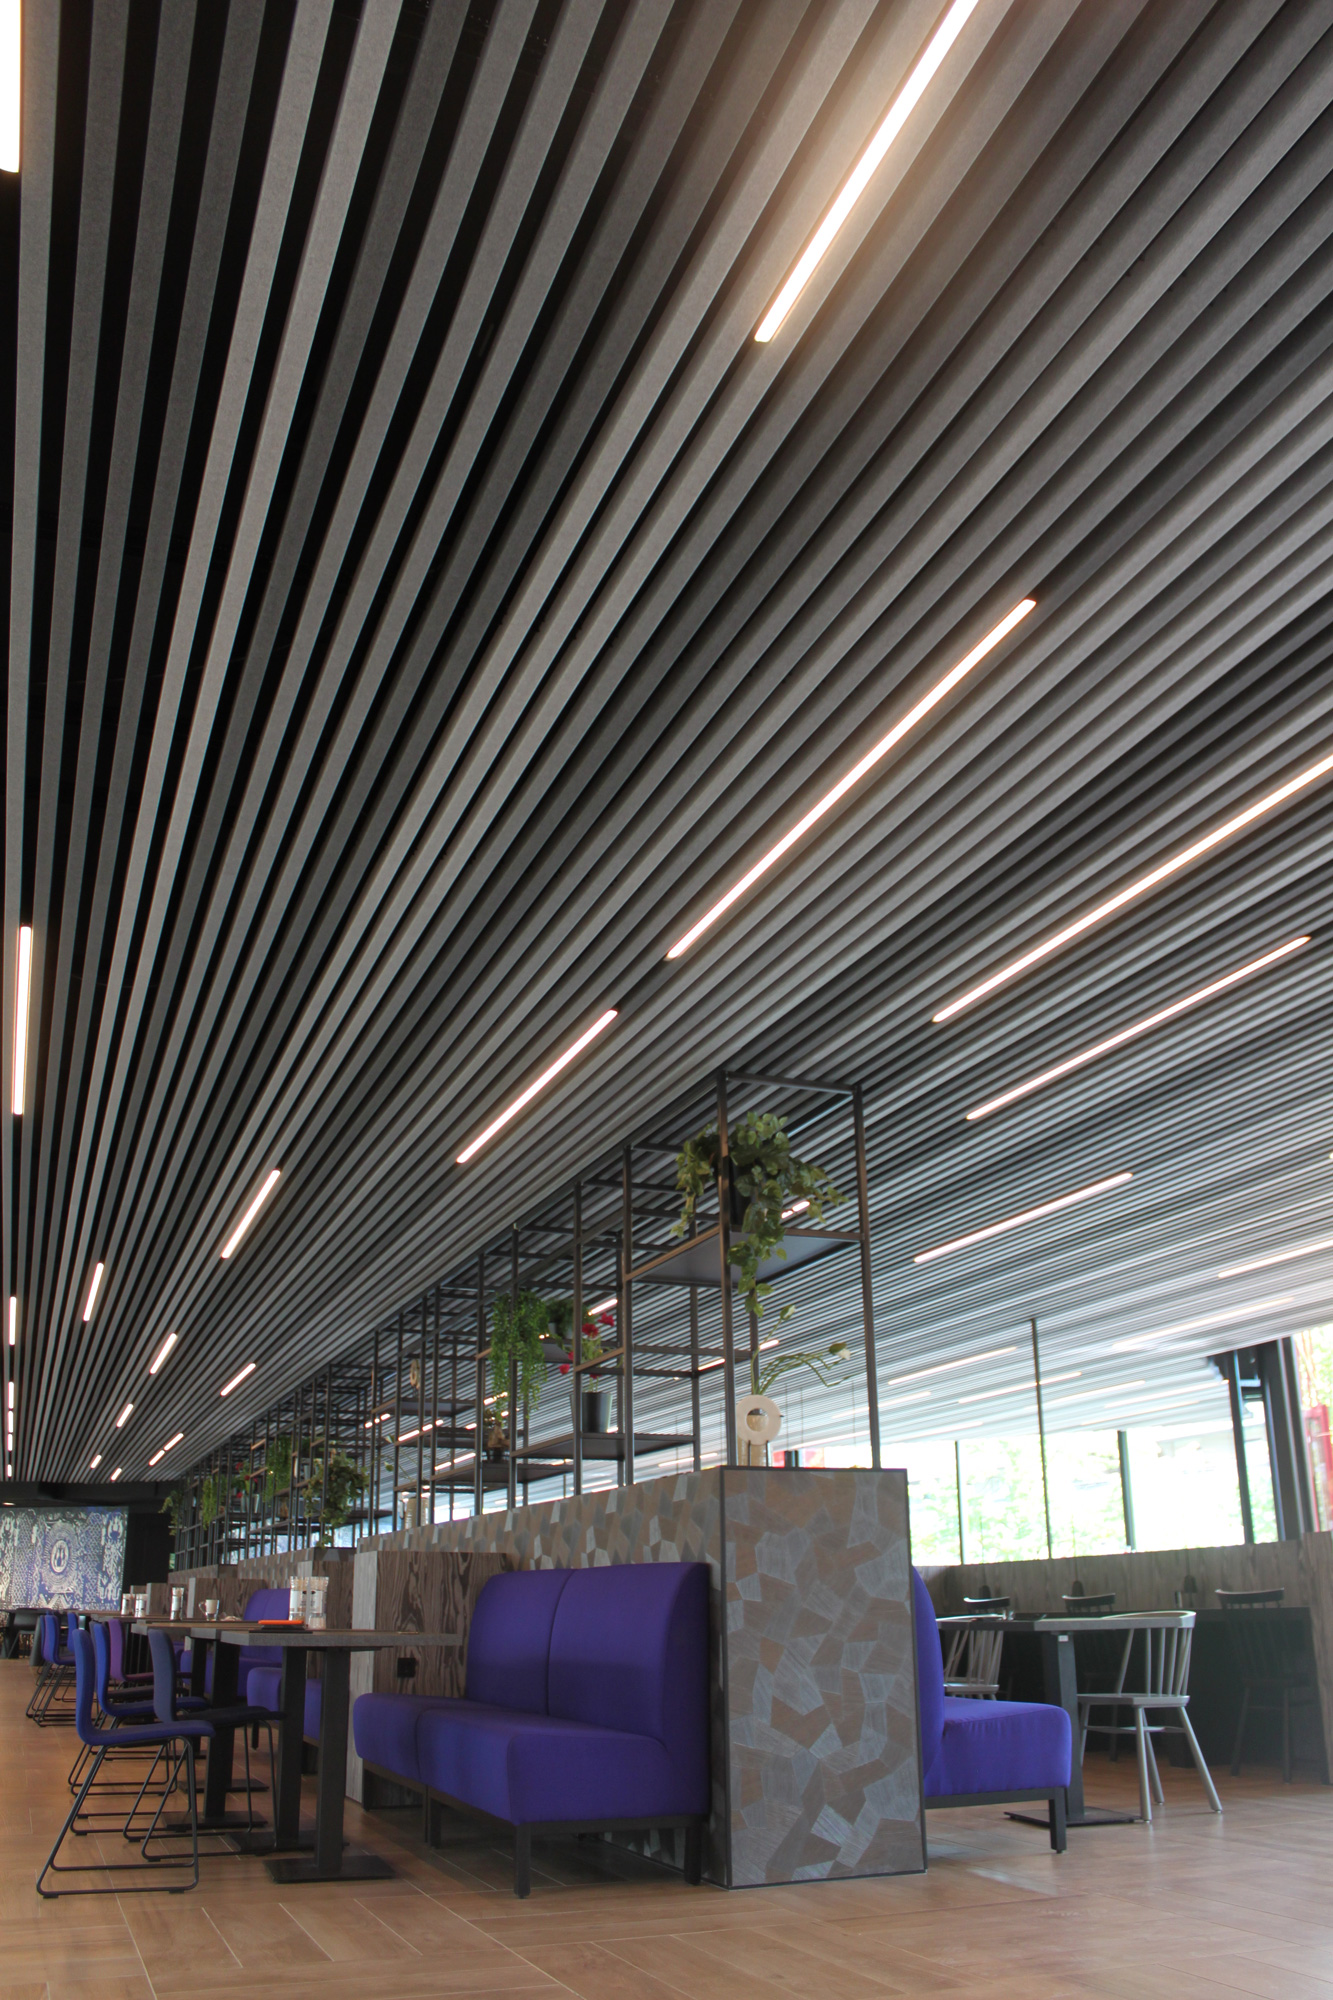 Heartfelt Modular Felt Ceiling System Redefines Ceilings